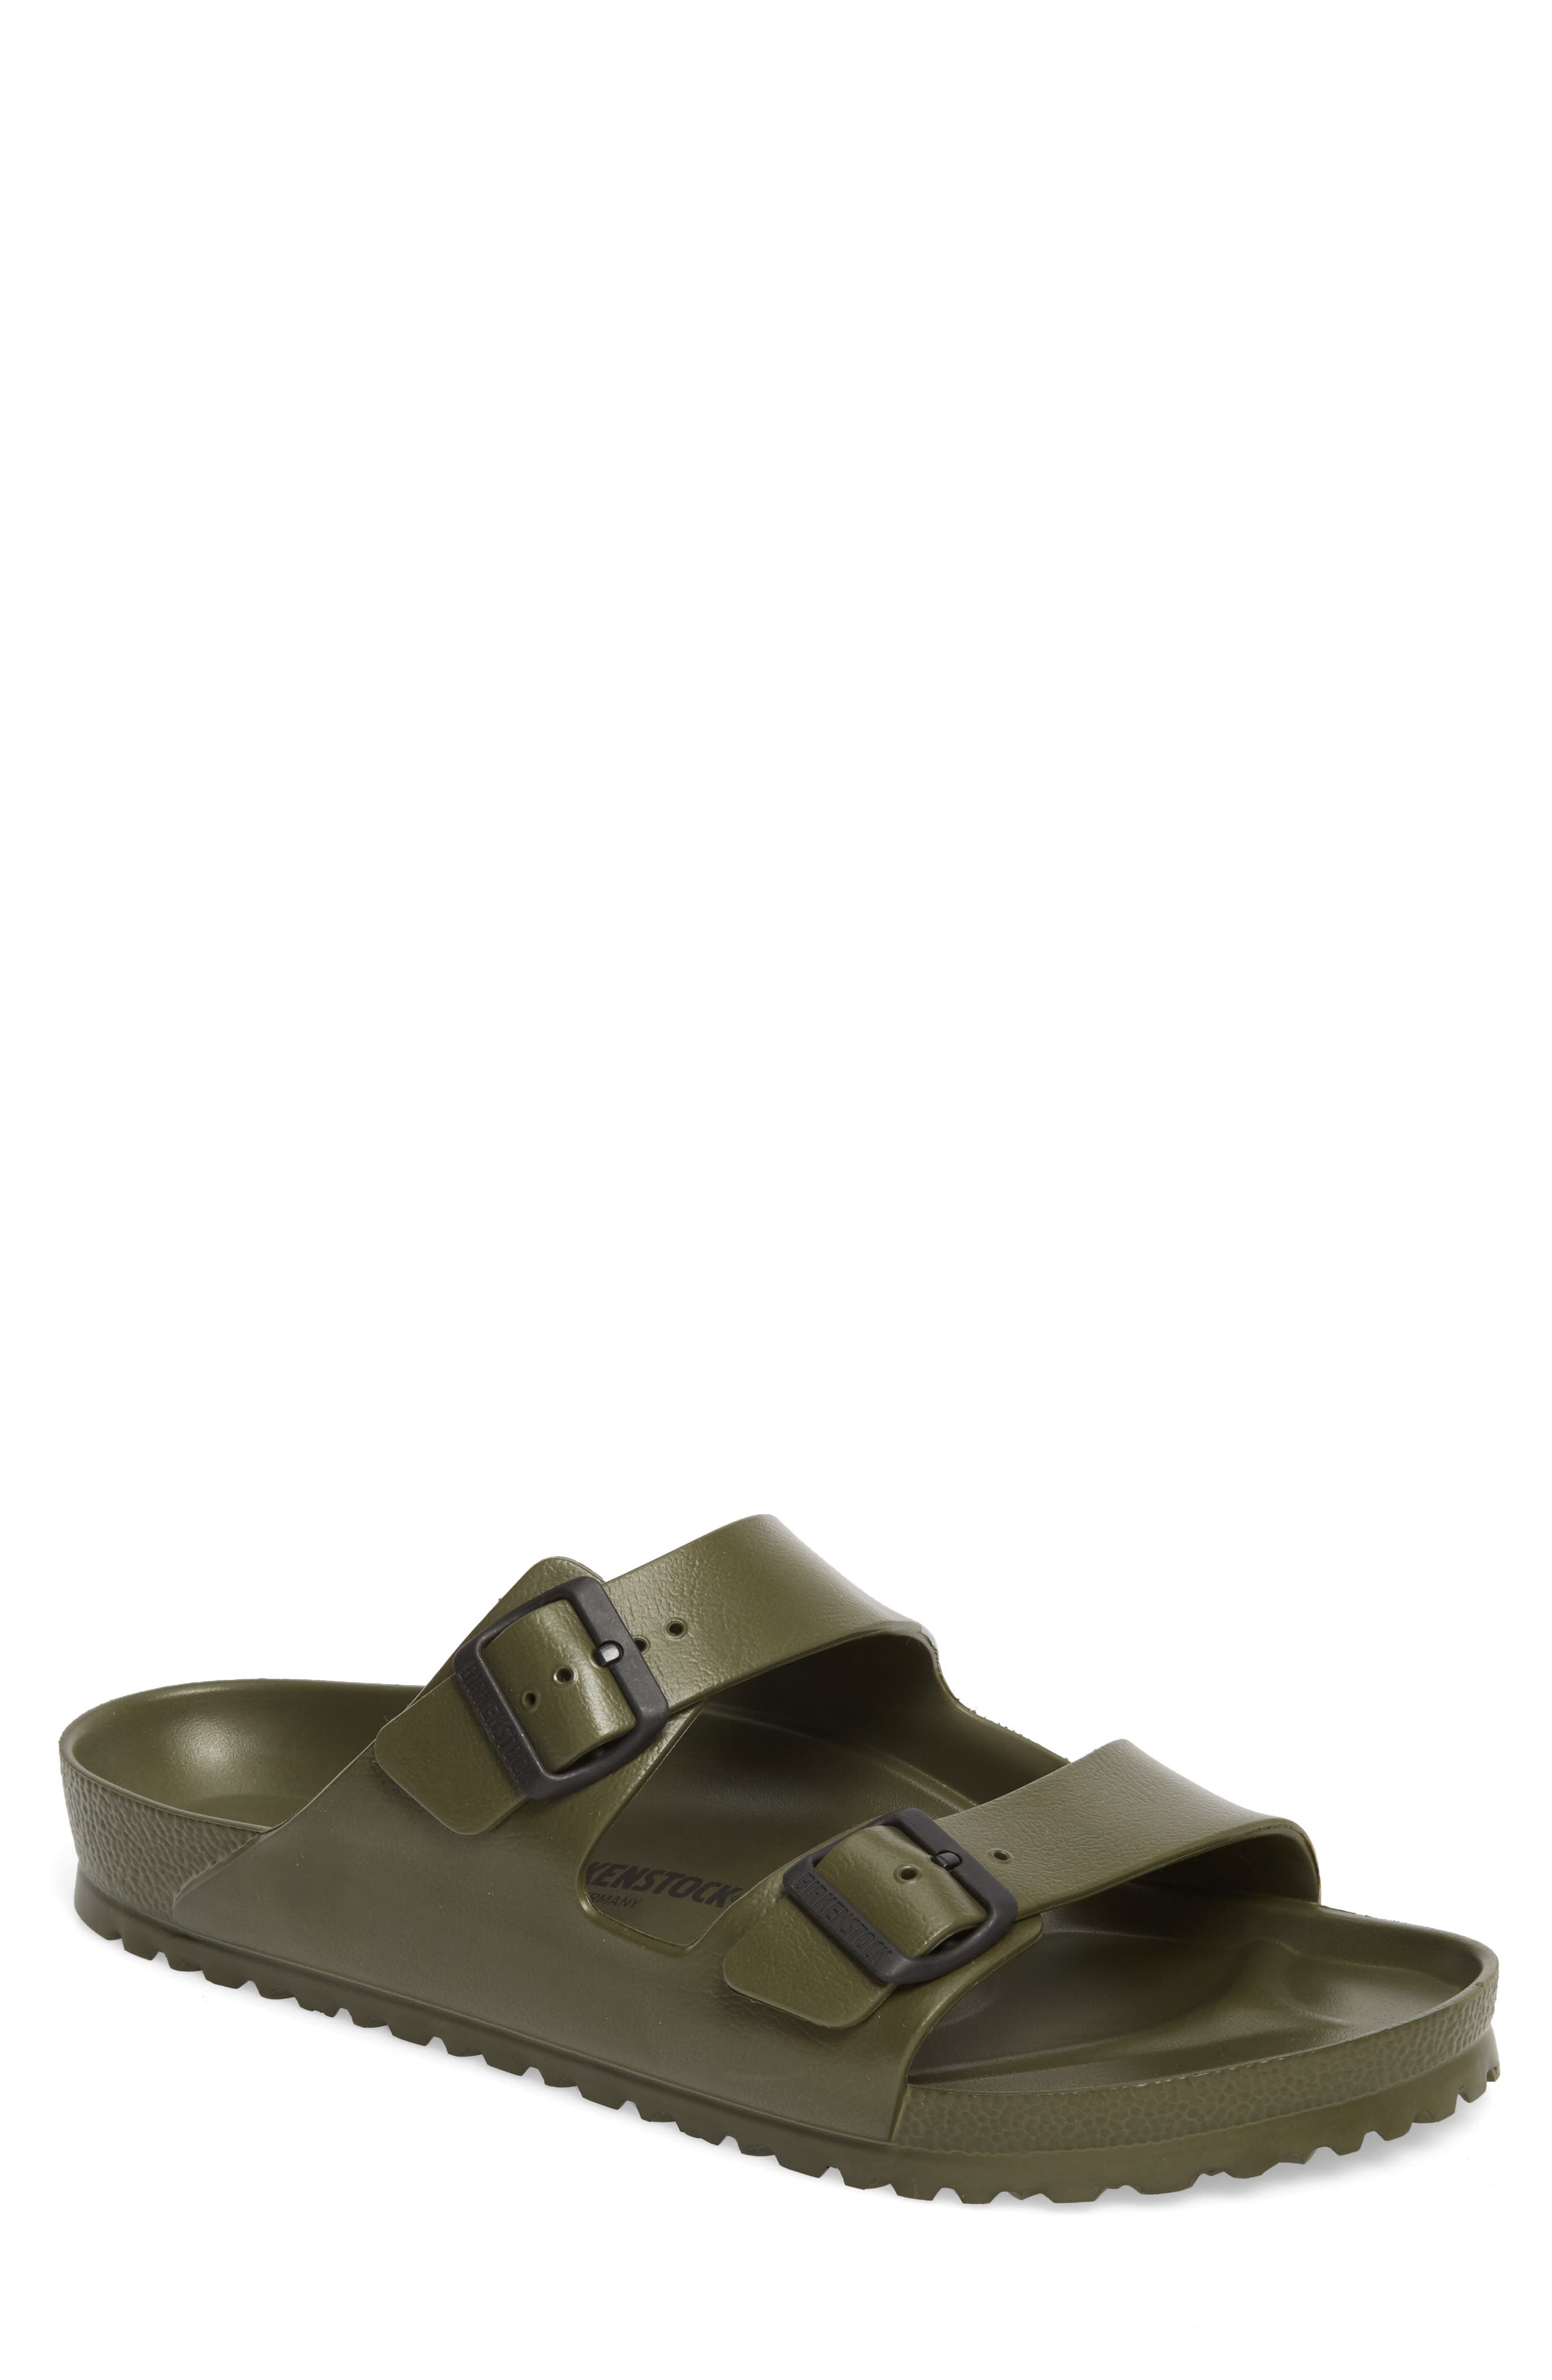 'Essentials - Arizona EVA' Waterproof Slide Sandal,                             Alternate thumbnail 2, color,                             GREEN